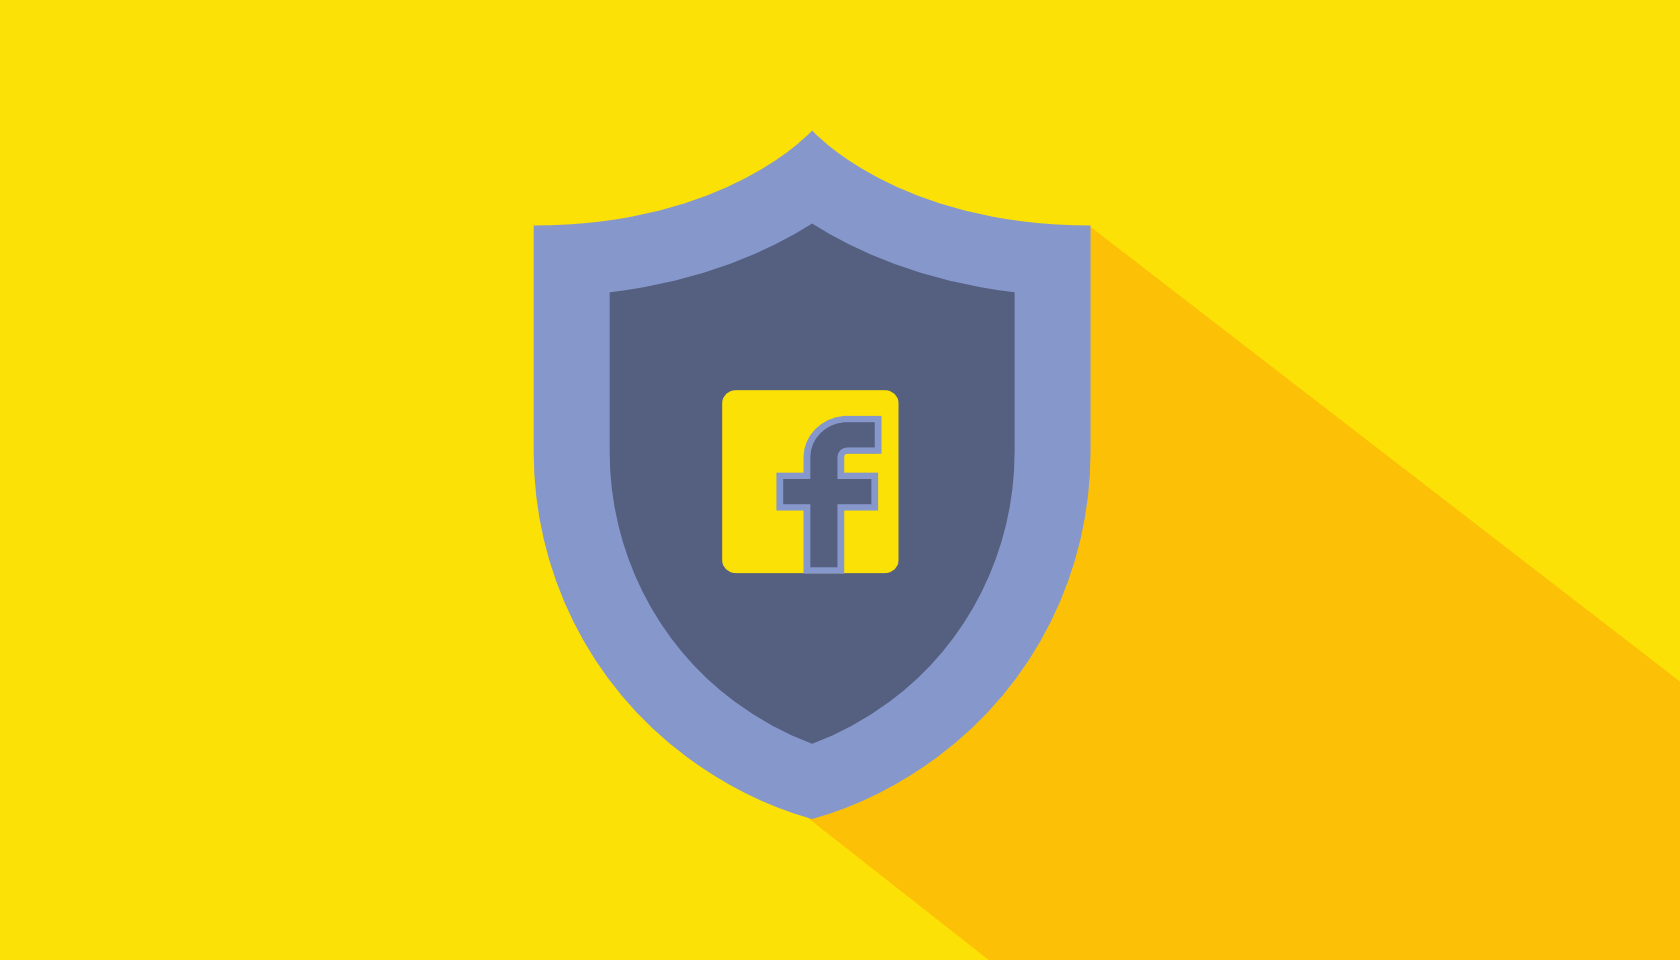 7 Tips For Creating a Trustworthy Social Media Presence